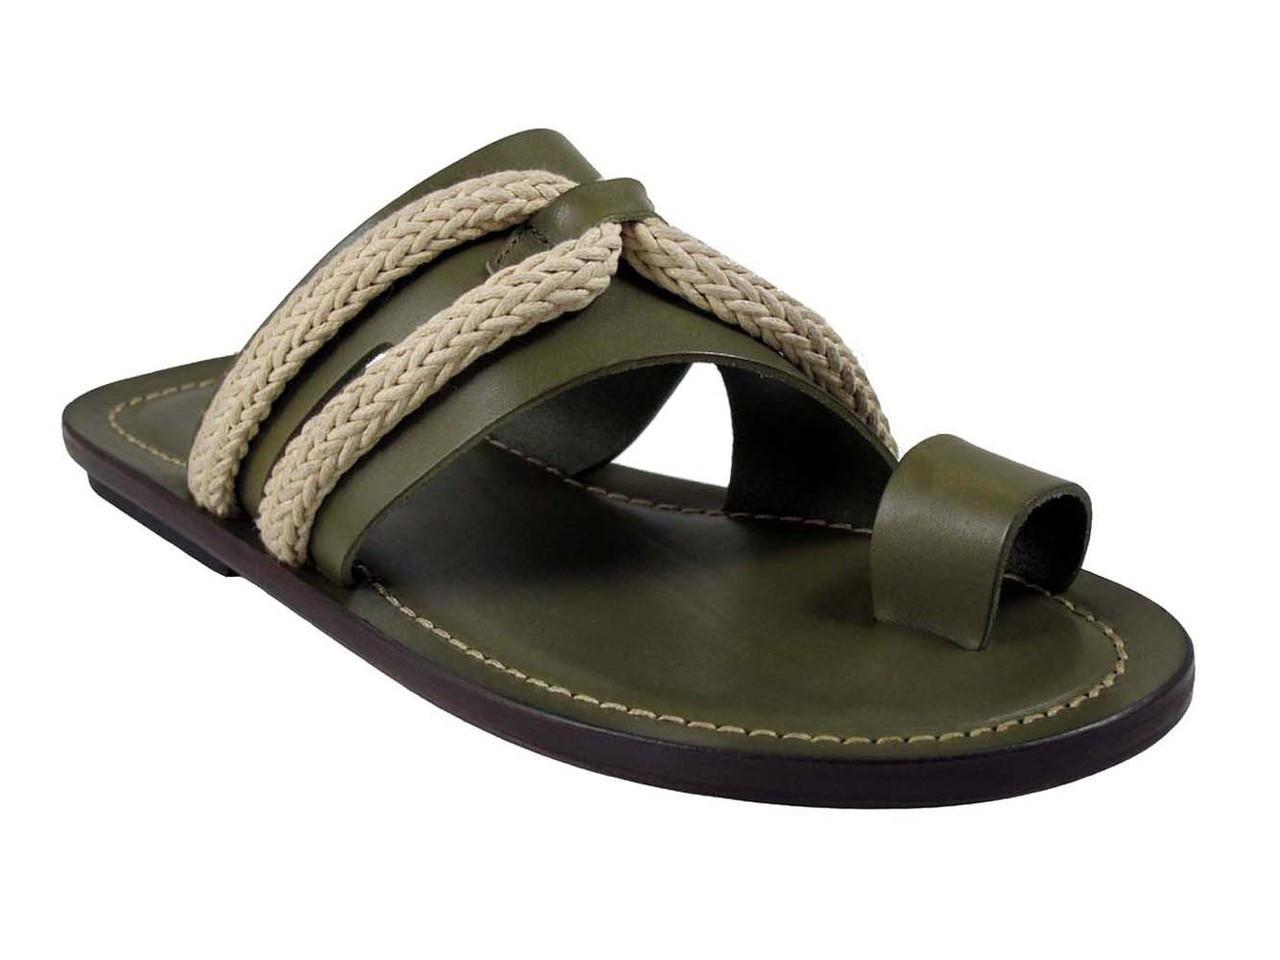 fd47706752f Davinci 3546 Men s Braided Rope Italian Leather Push in Toe Sandals ...